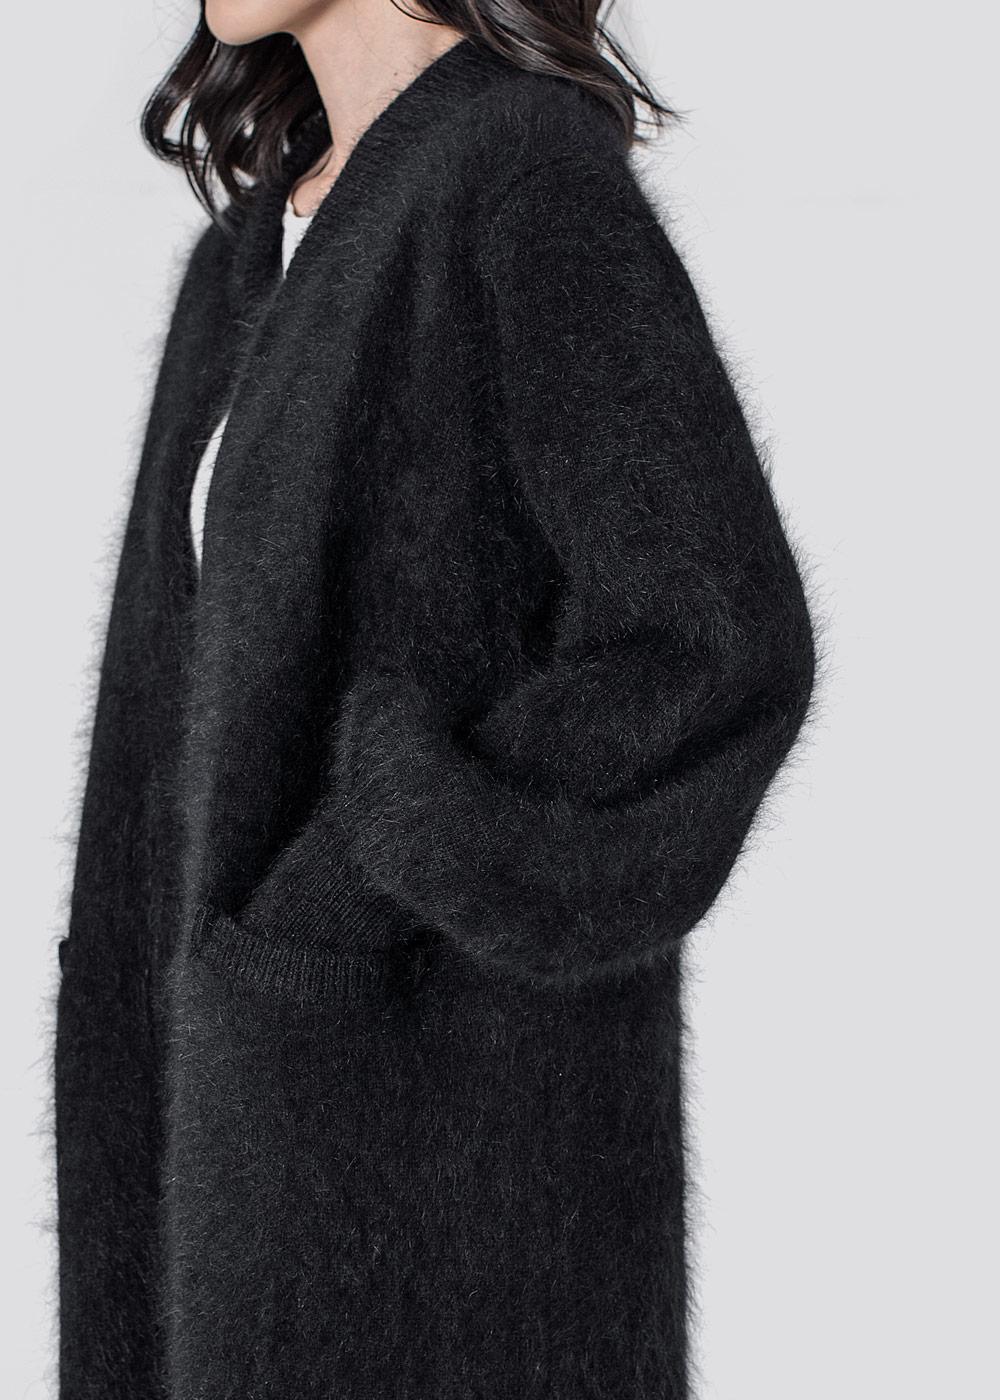 byTSANG Fuzzy Cardigan Coat, byTSANG Fluffy Cardigan, byTSANG Fuzzy Cardigan